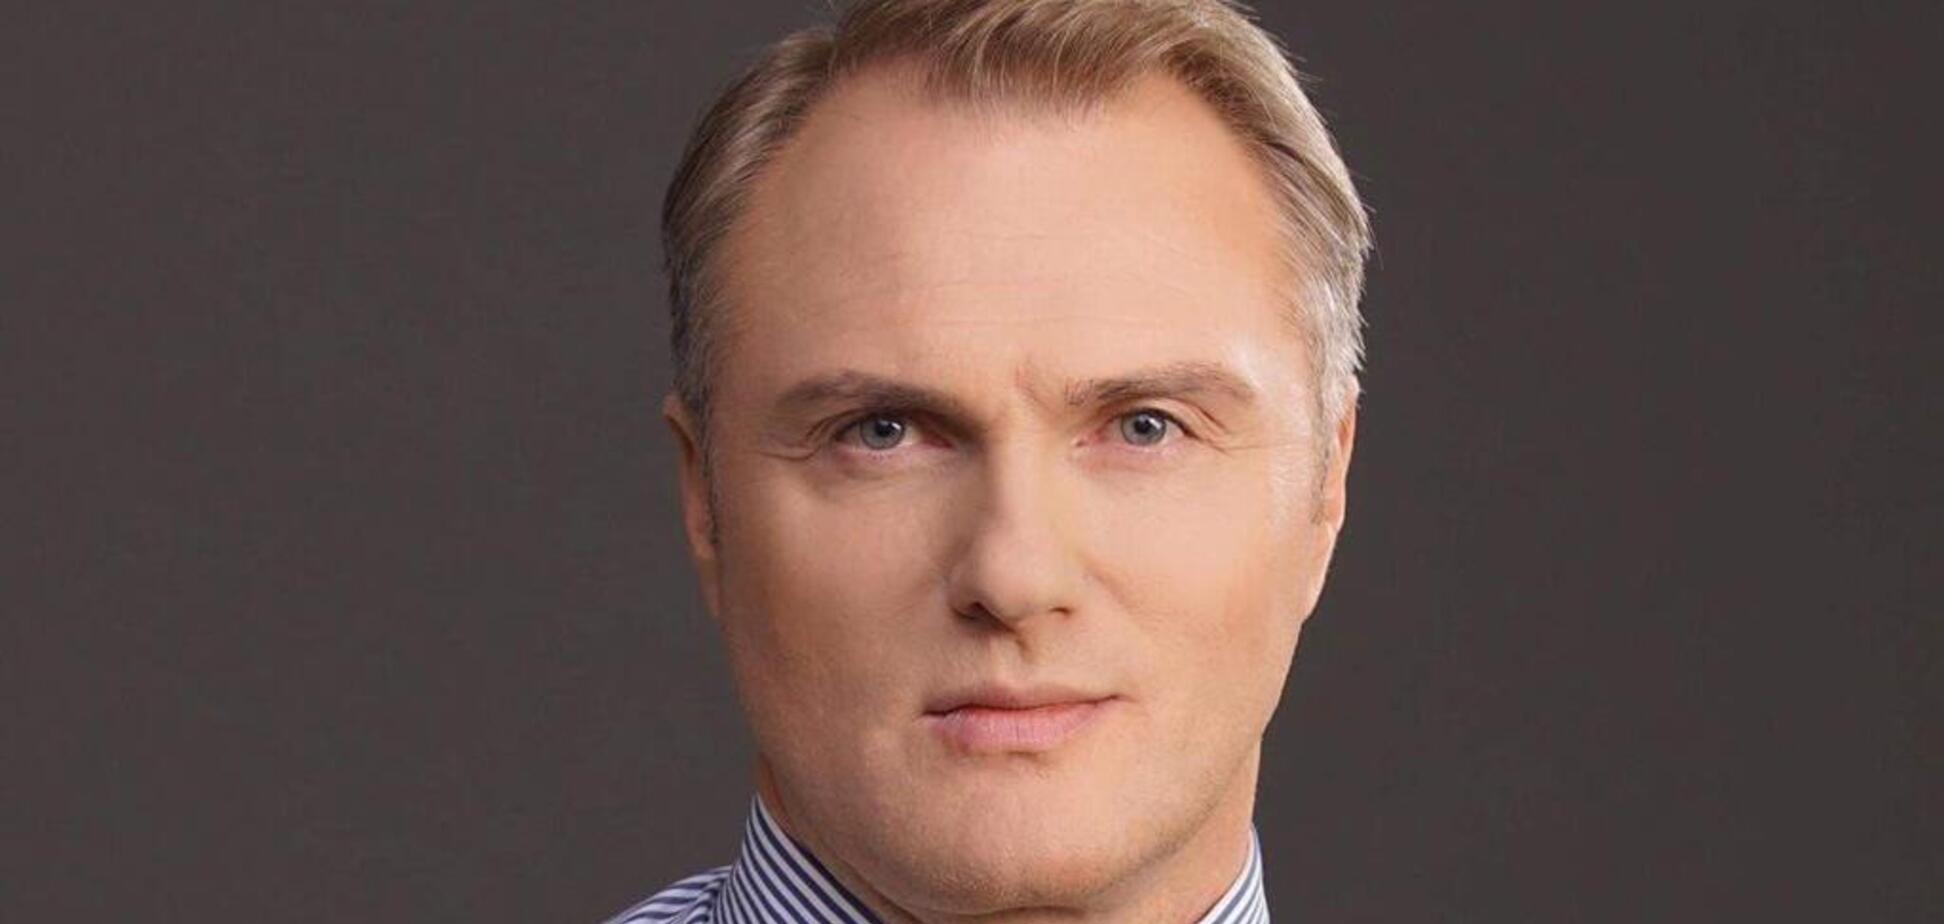 Євген Рибчинський